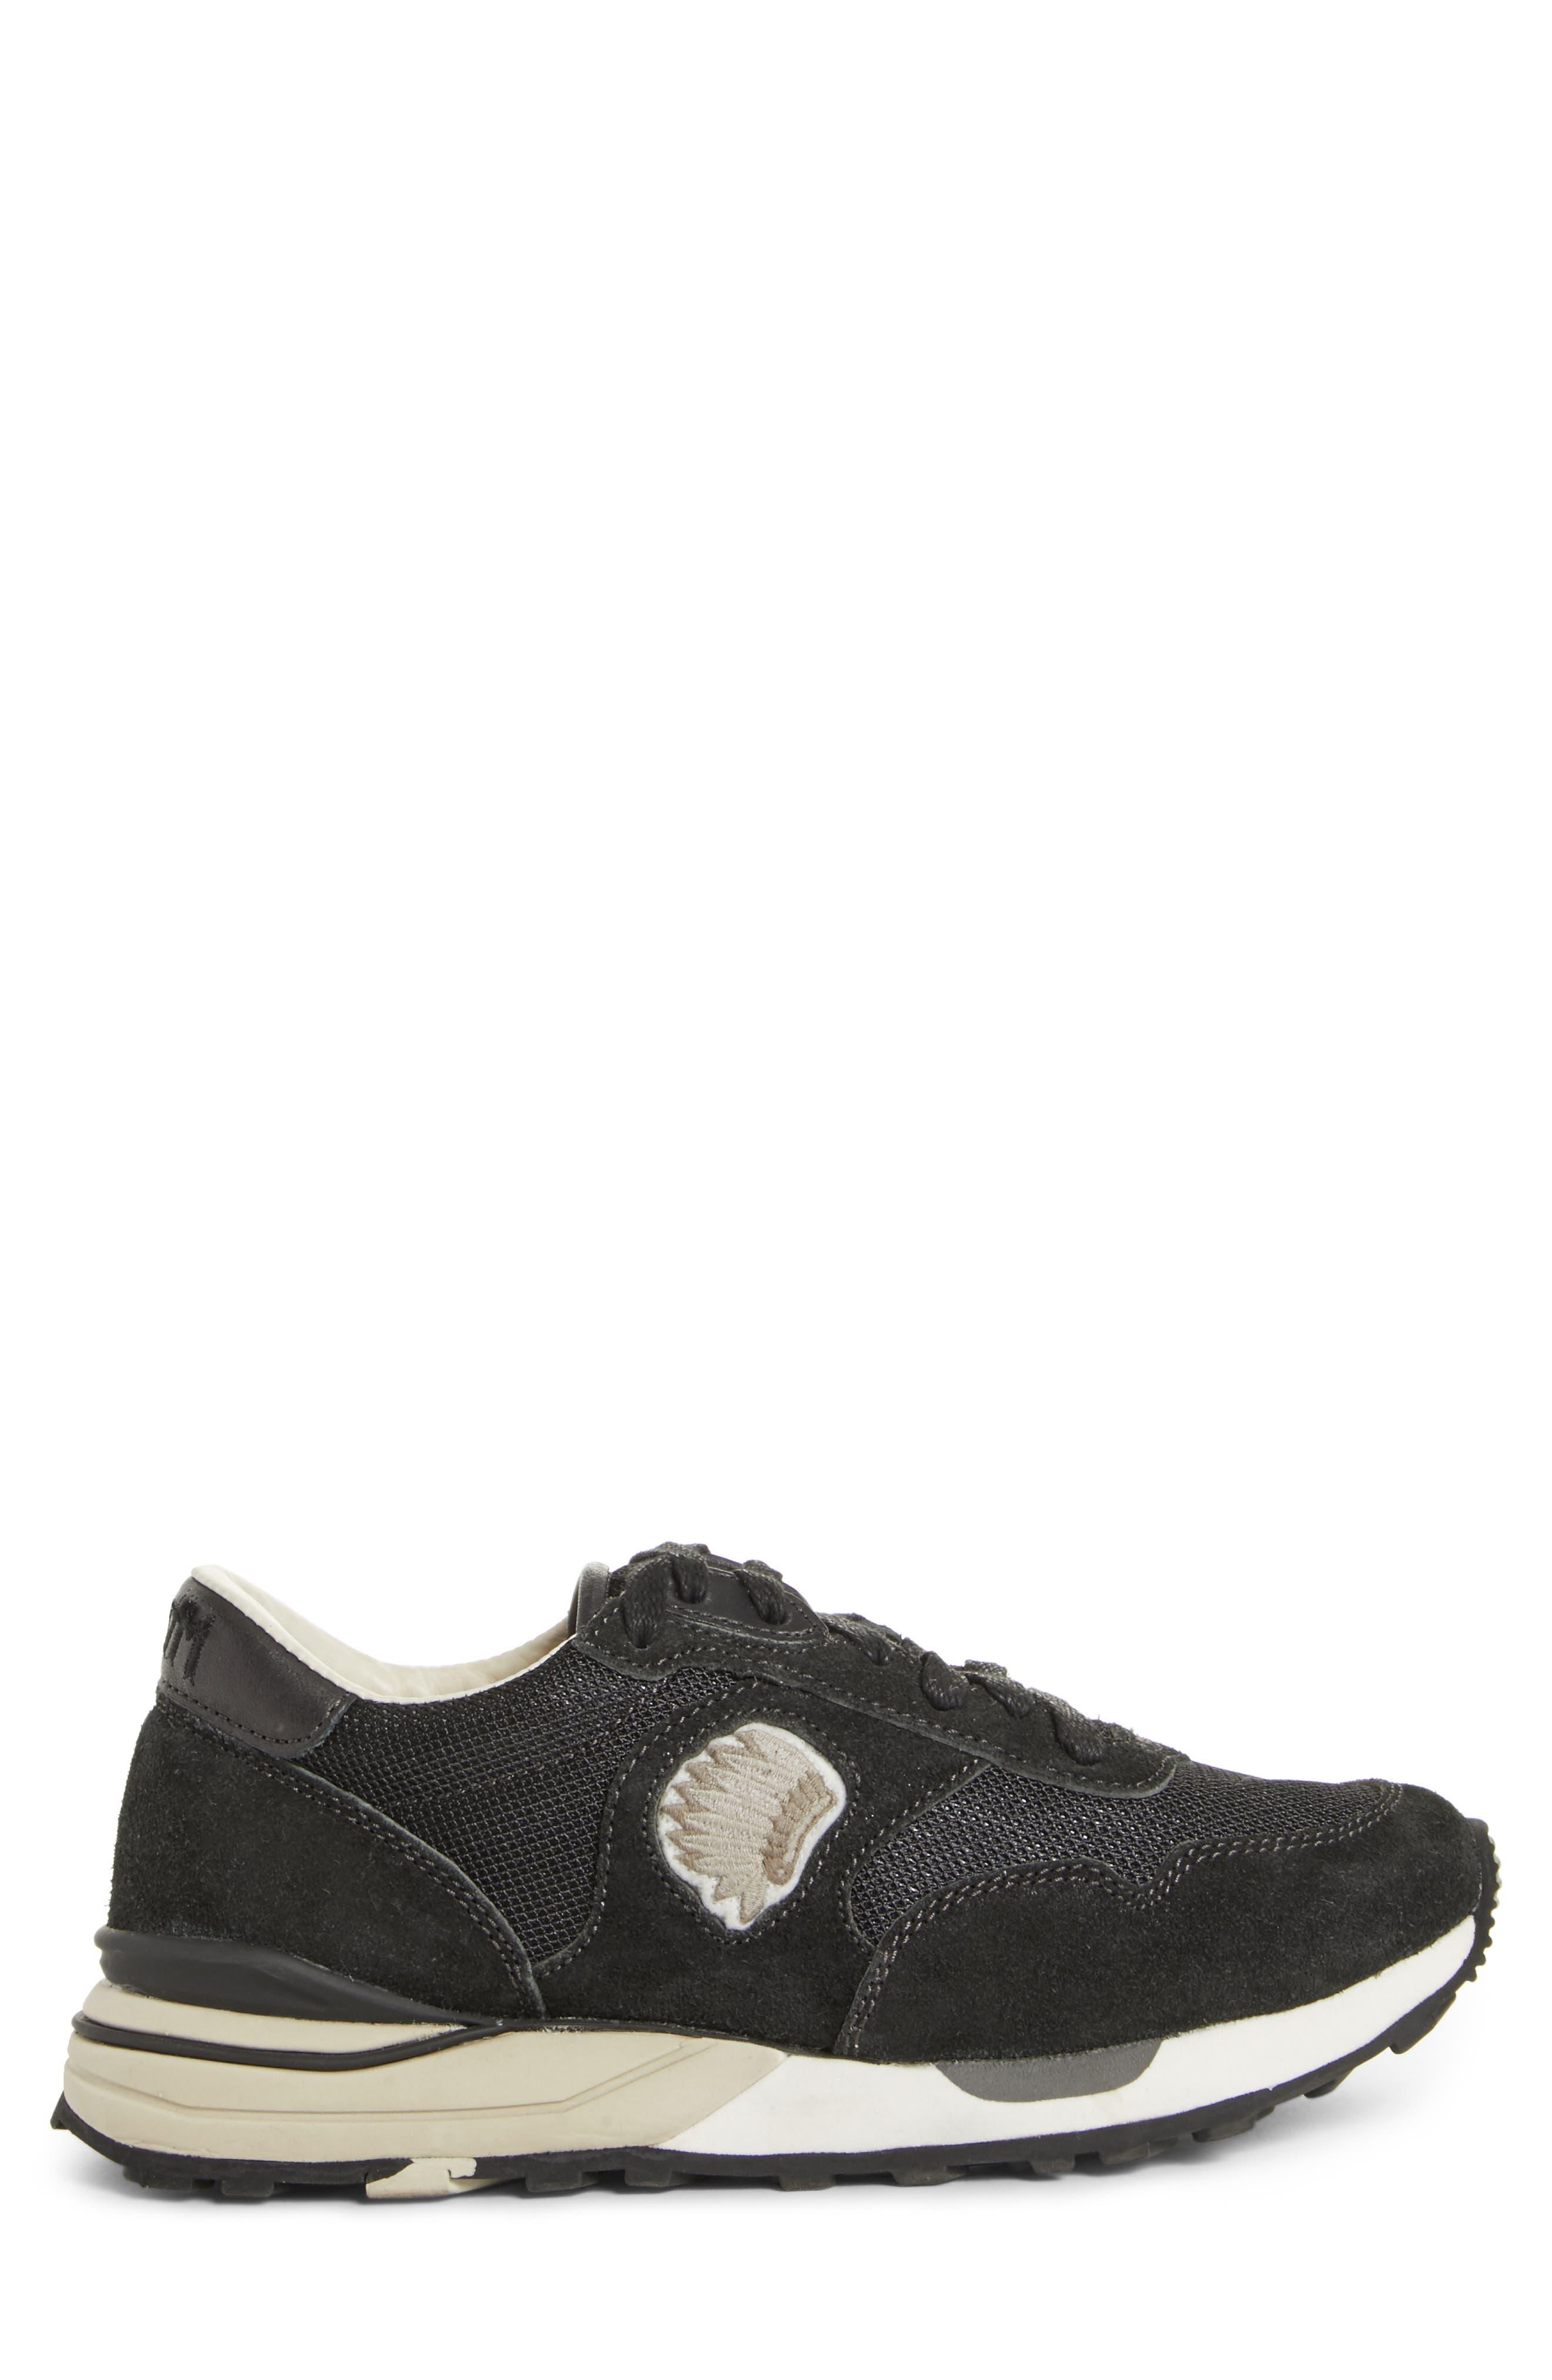 Roland Jogger Sneaker,                             Alternate thumbnail 3, color,                             002